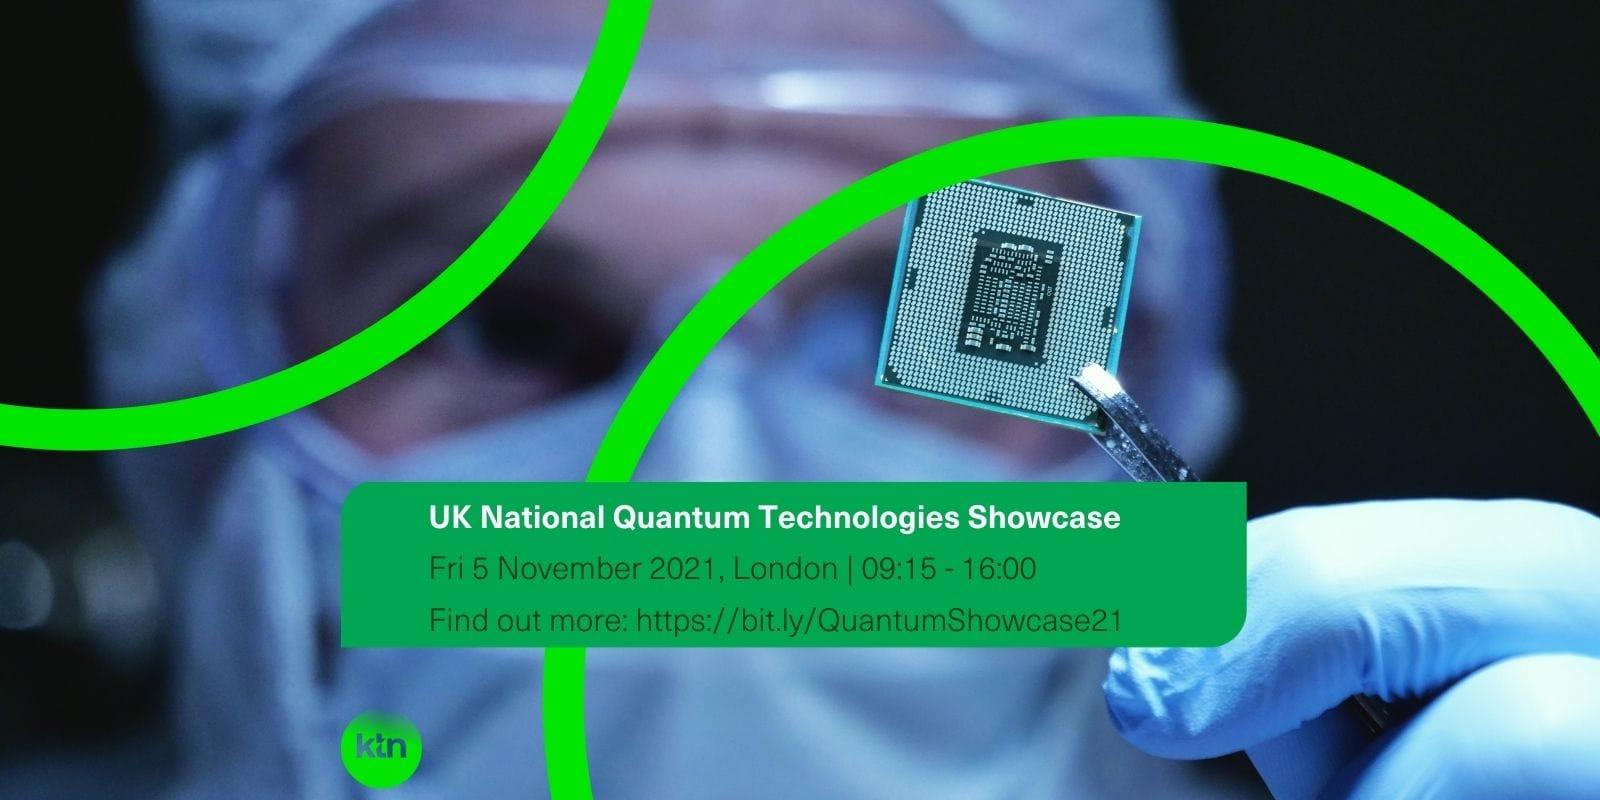 UK National Quantum Technologies Showcase 2021